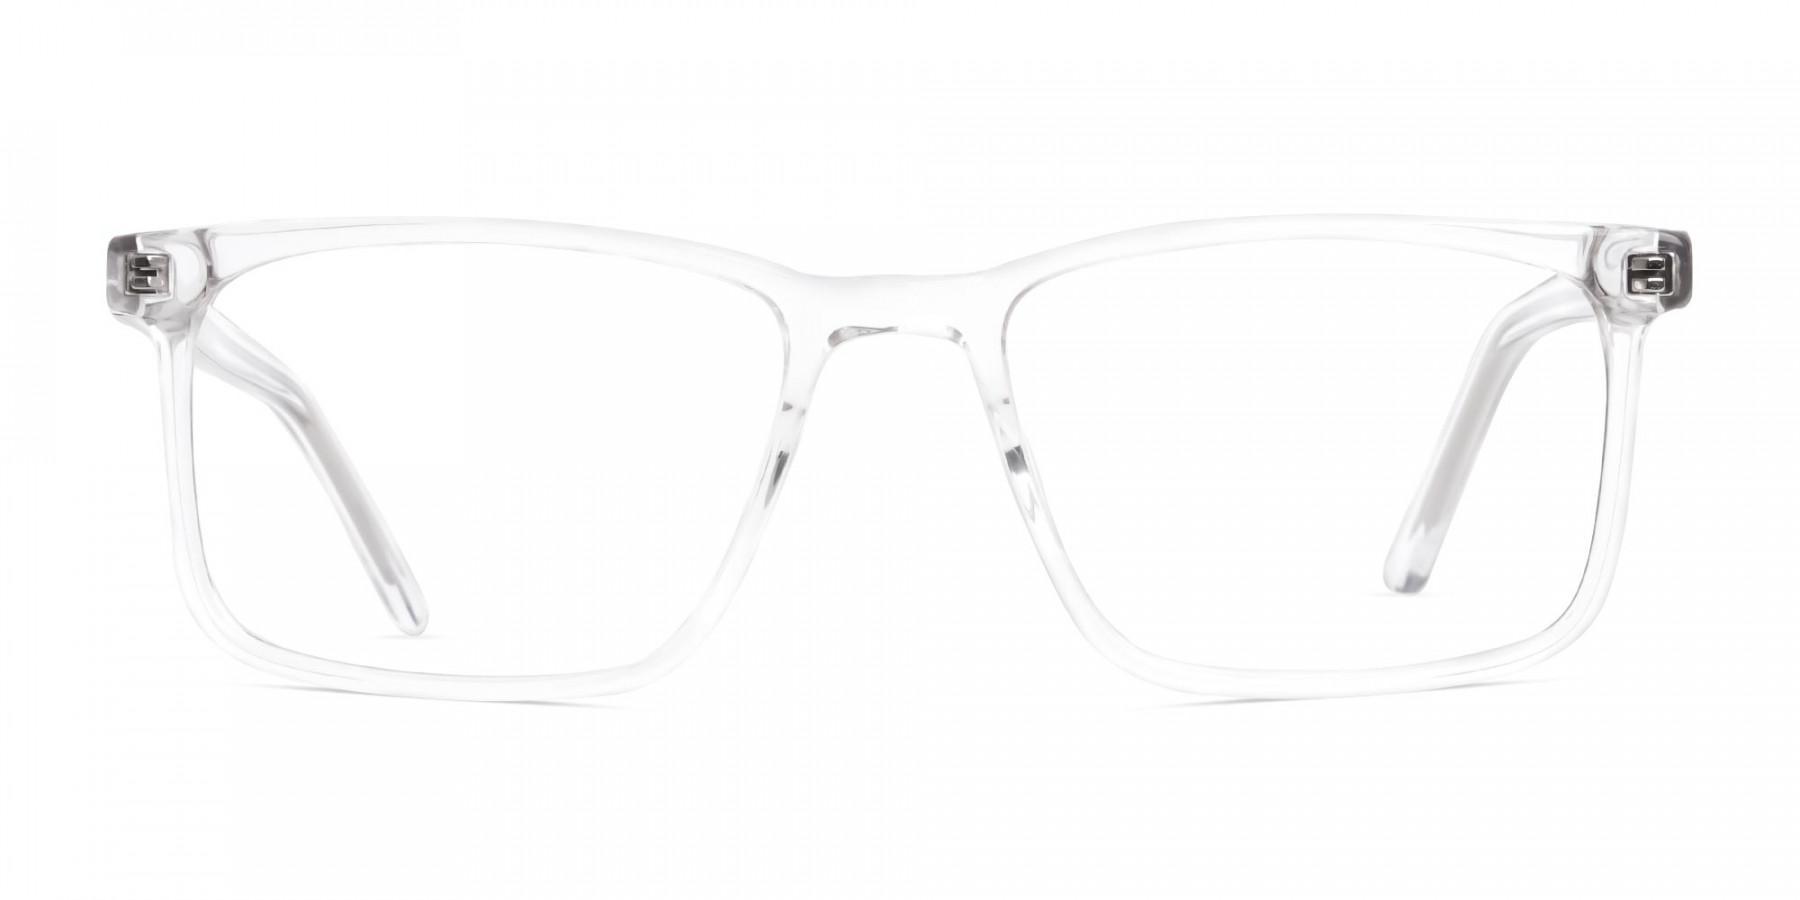 designer-transparent-rectangular-glasses-frames-1